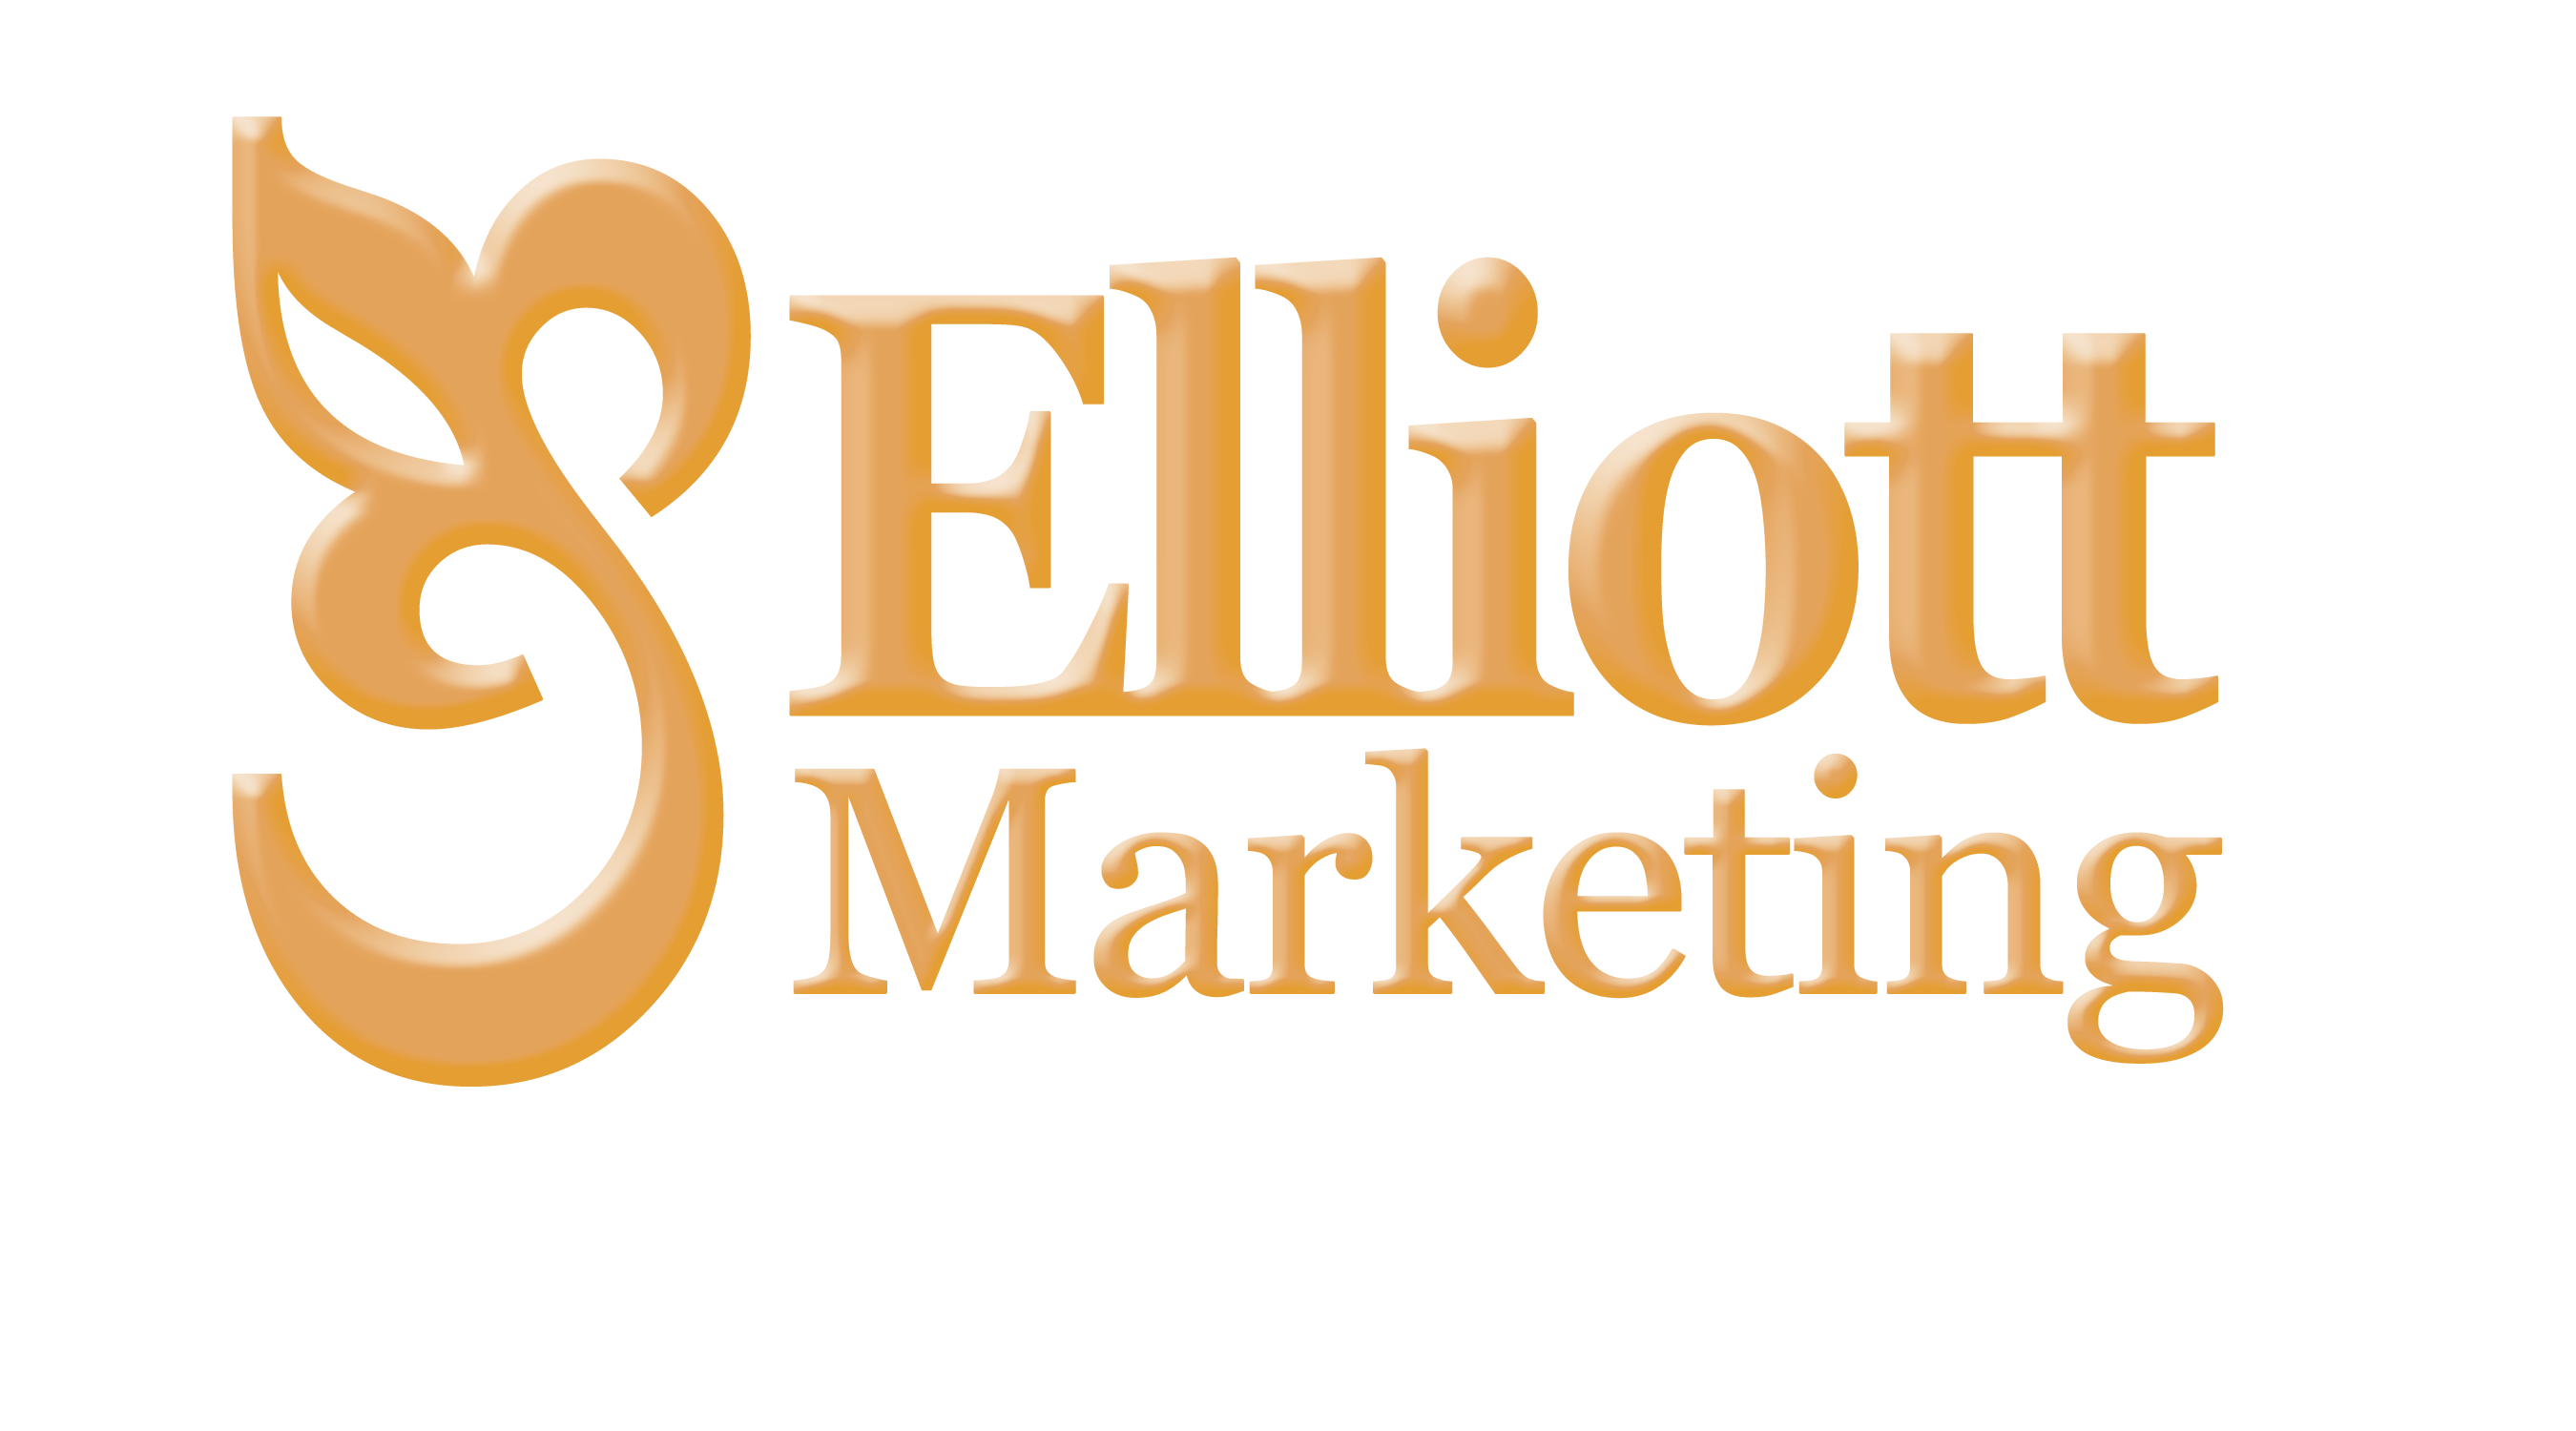 Elliott Marketing